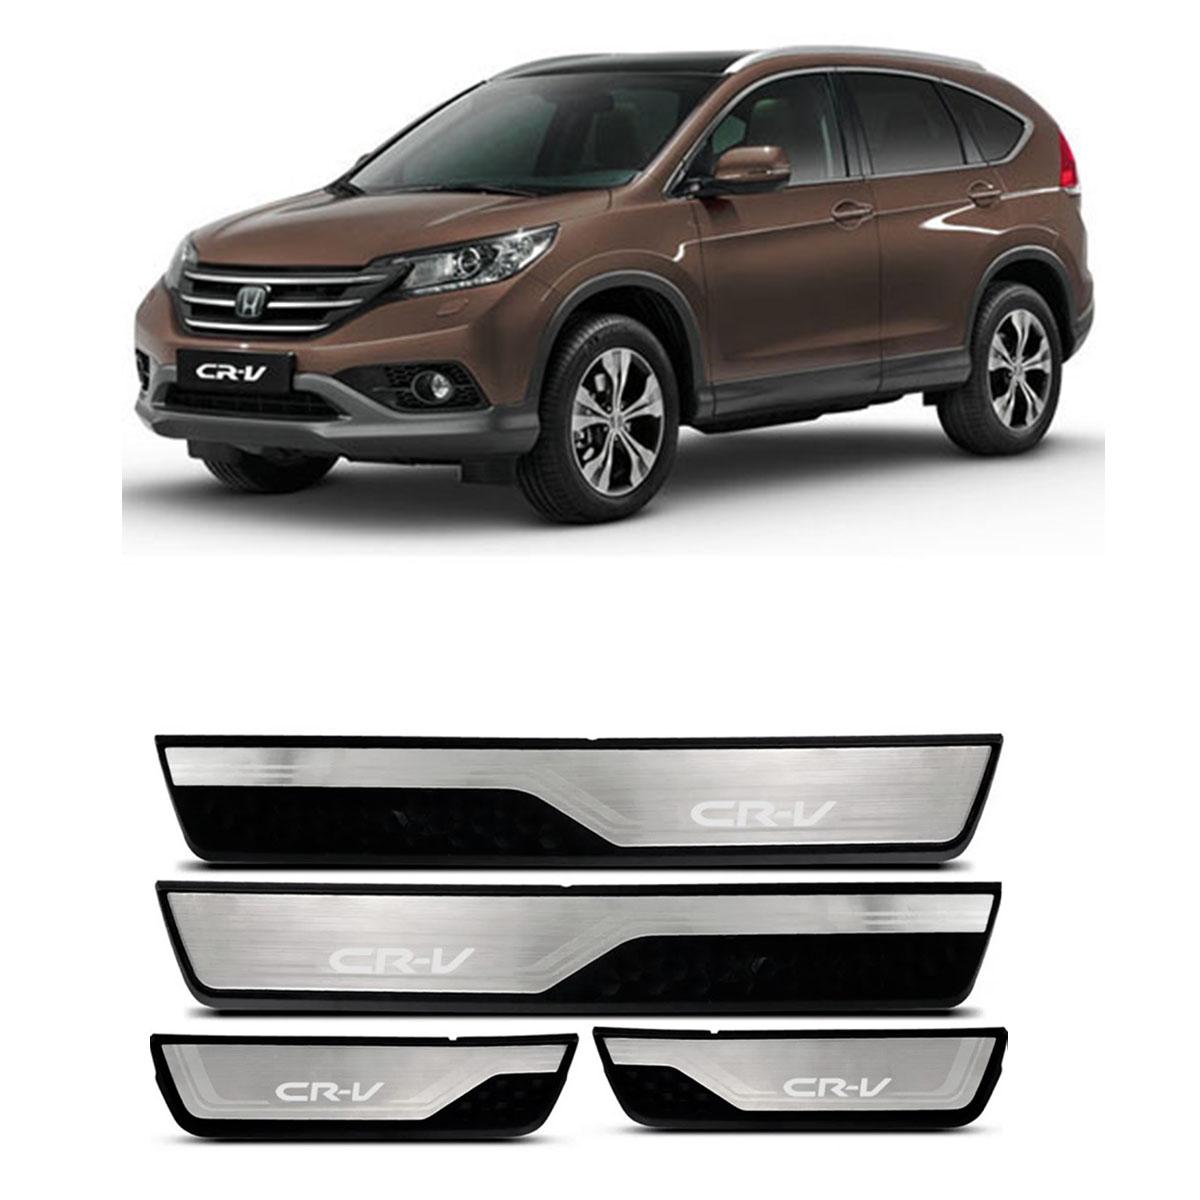 Kit Soleira de Porta Com LED Honda CR-V Inox Iluminada SOL010